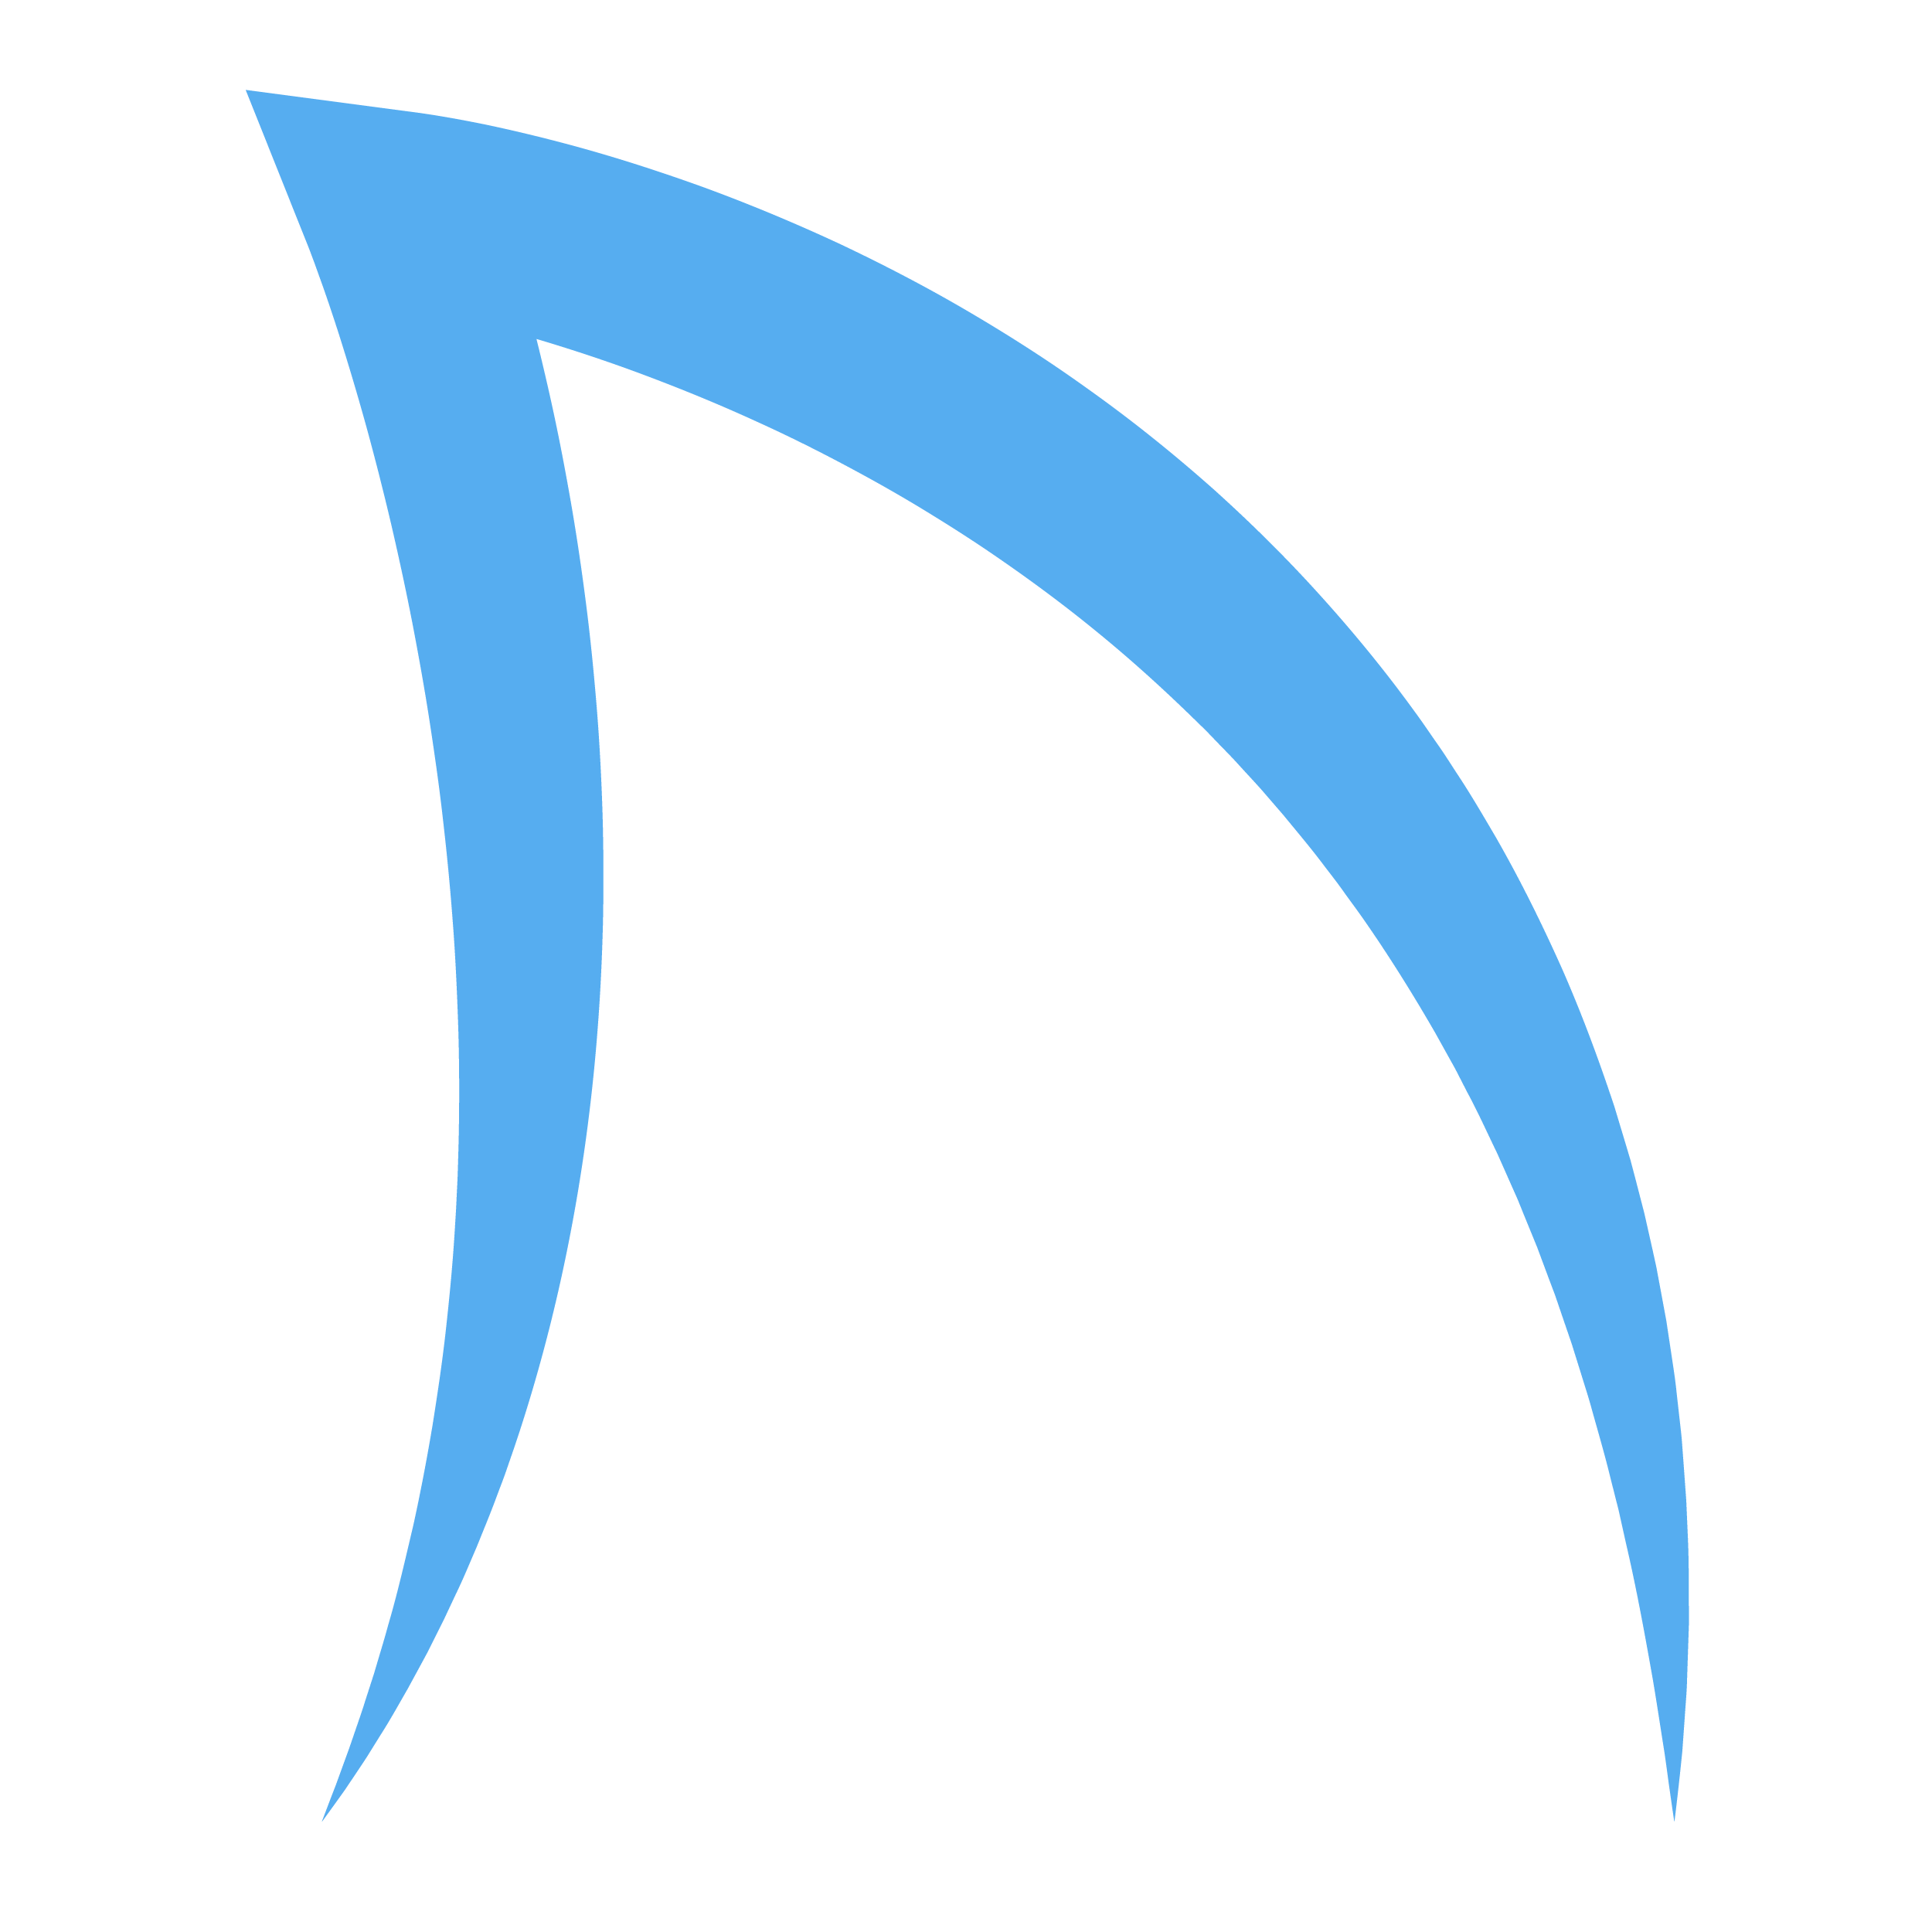 adshark-fin-logo-new-final-01